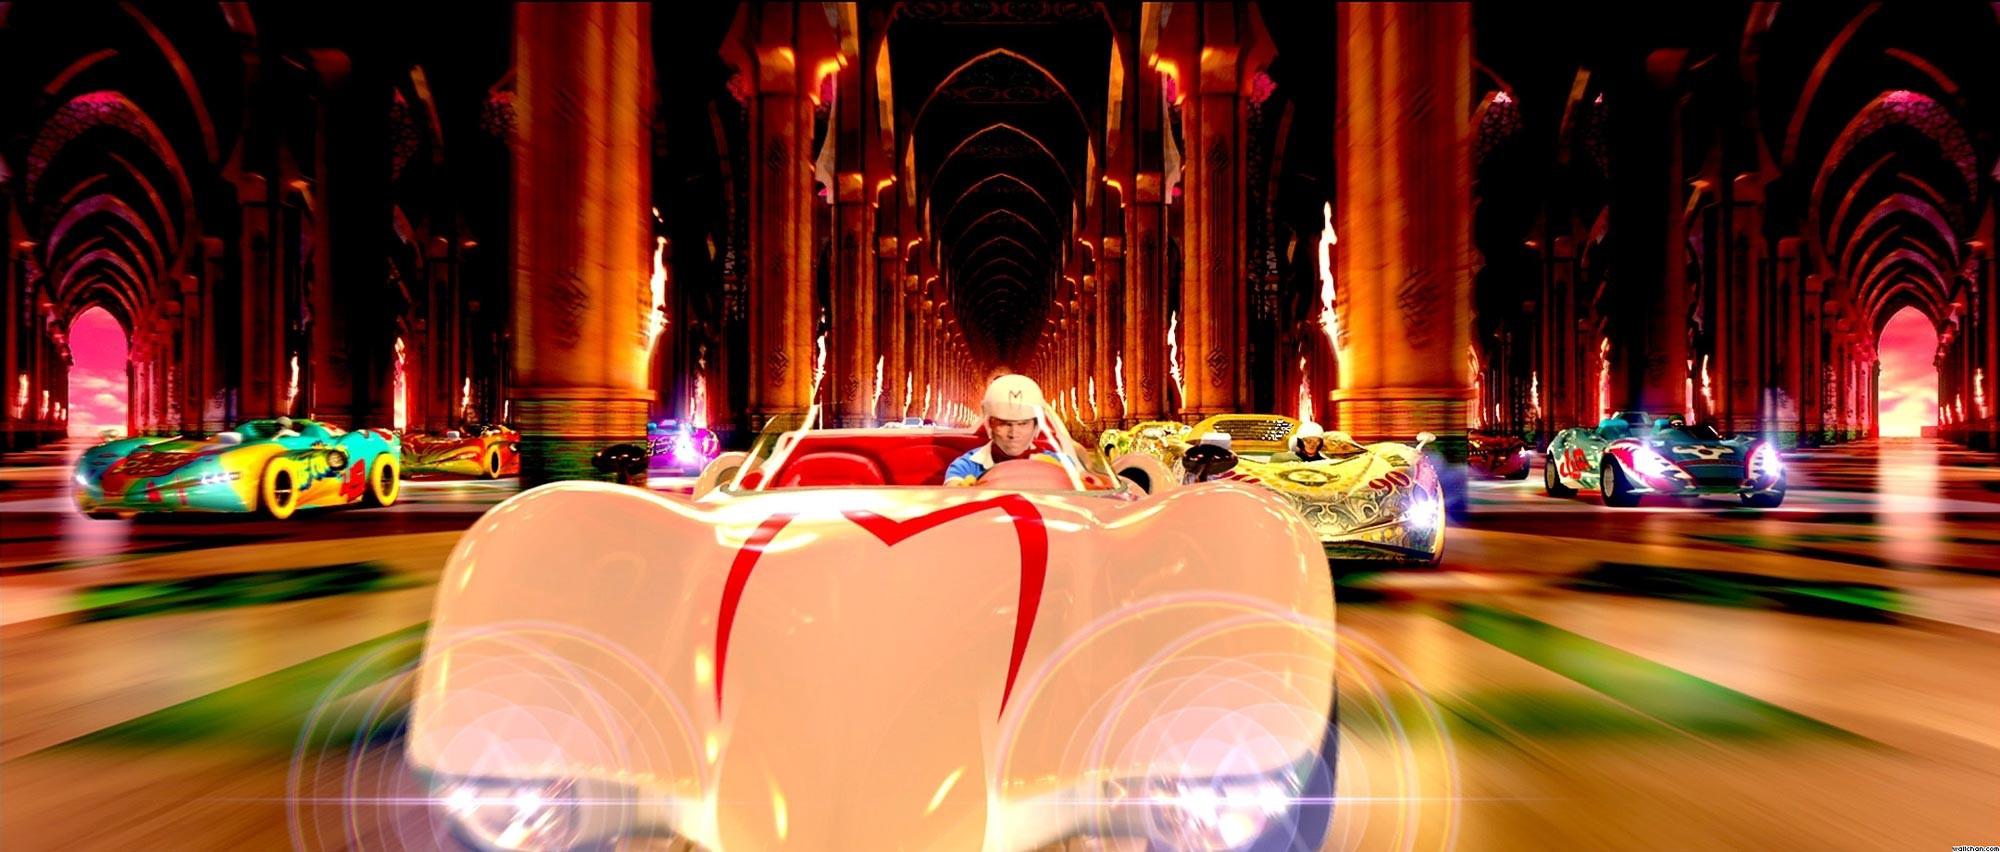 Speed Racer 2008